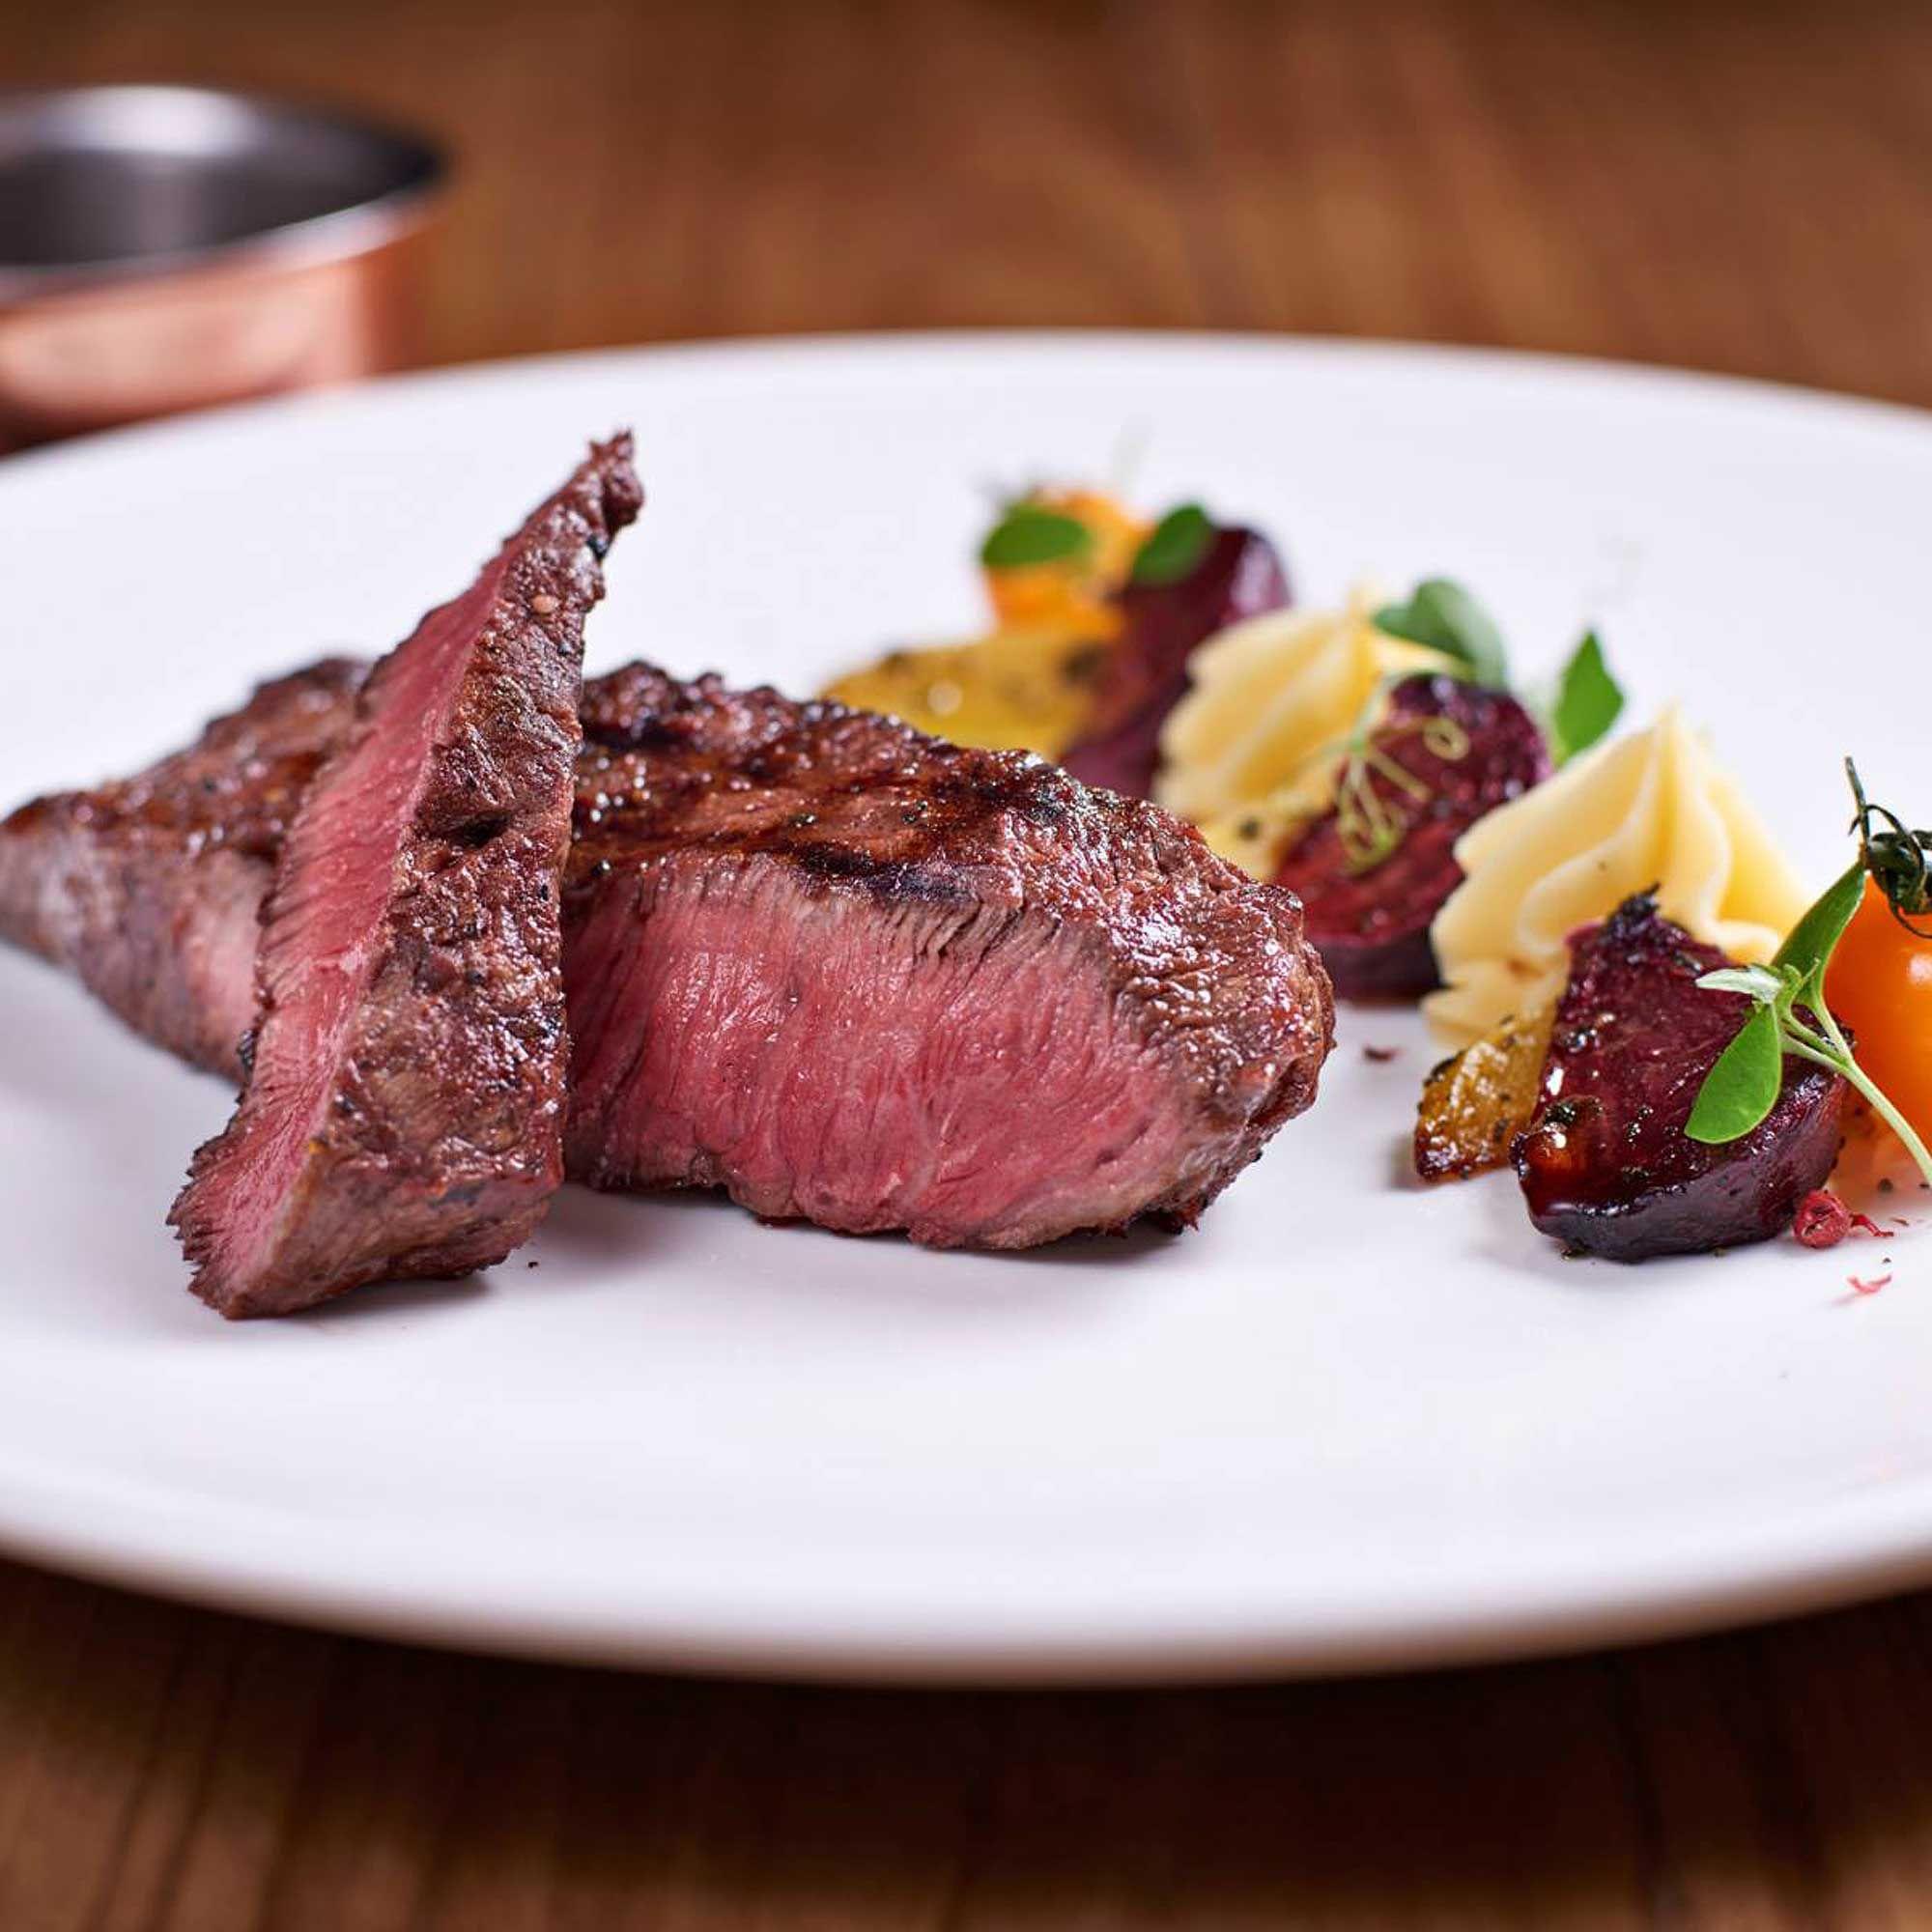 10 Restaurants To Go When You Need A Good Steak In Kuala Lumpur